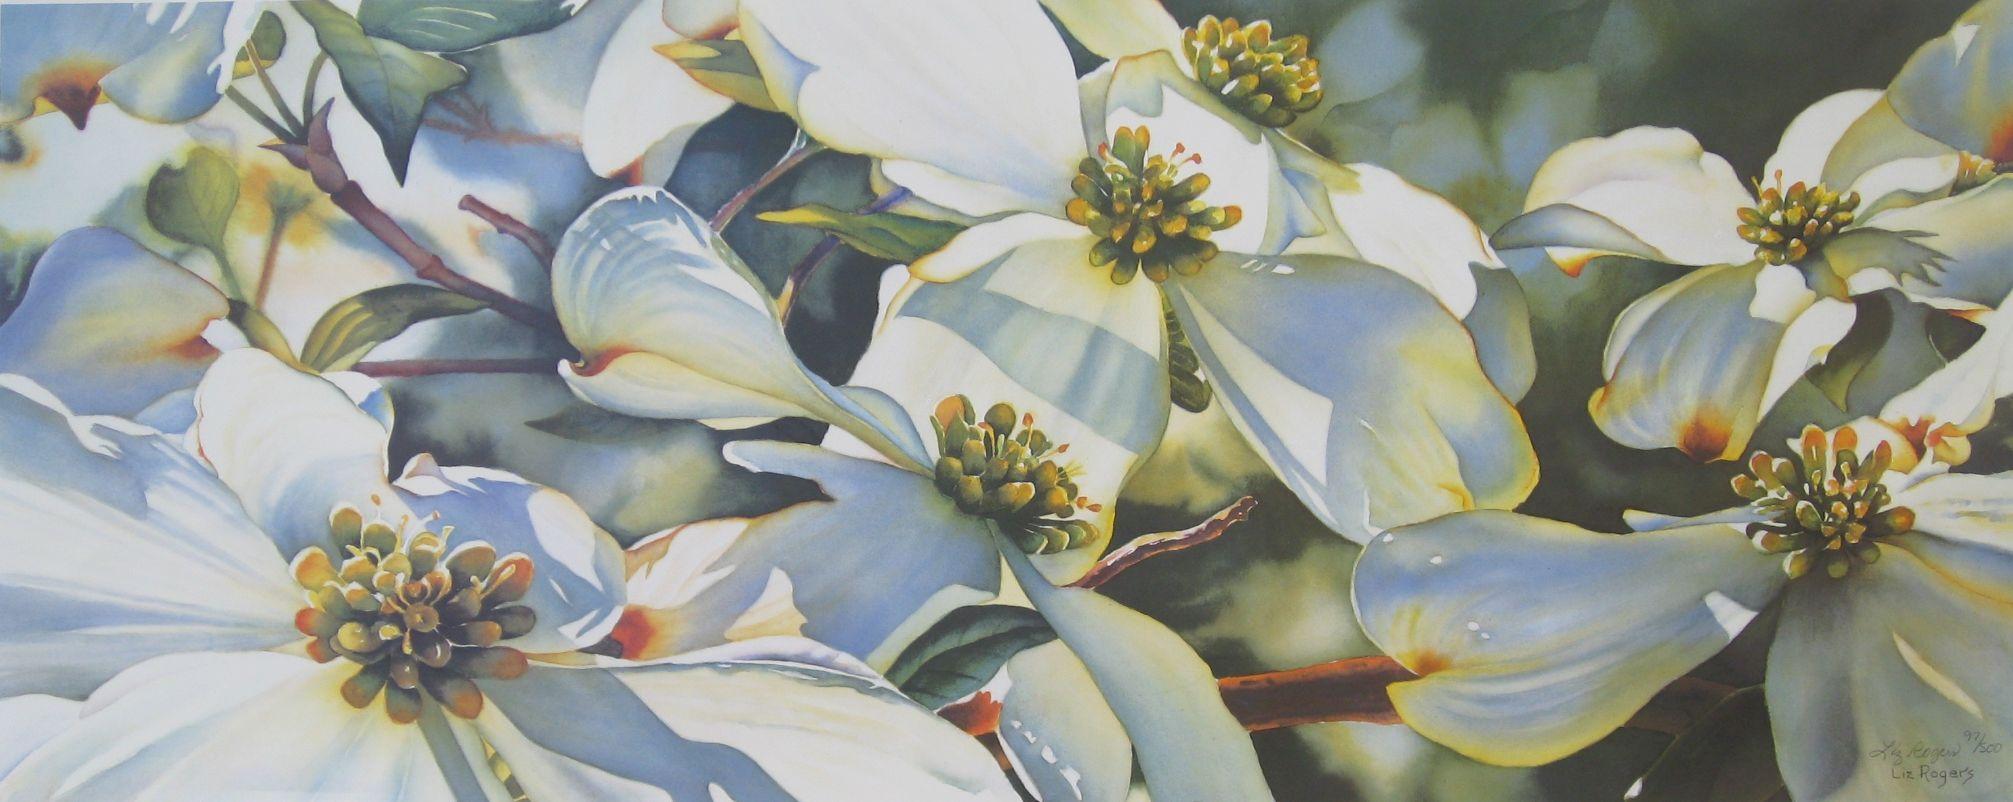 2013x802 Dogwood Watercolor, Watercolor Flowers, Flower Watercolor Art Prints